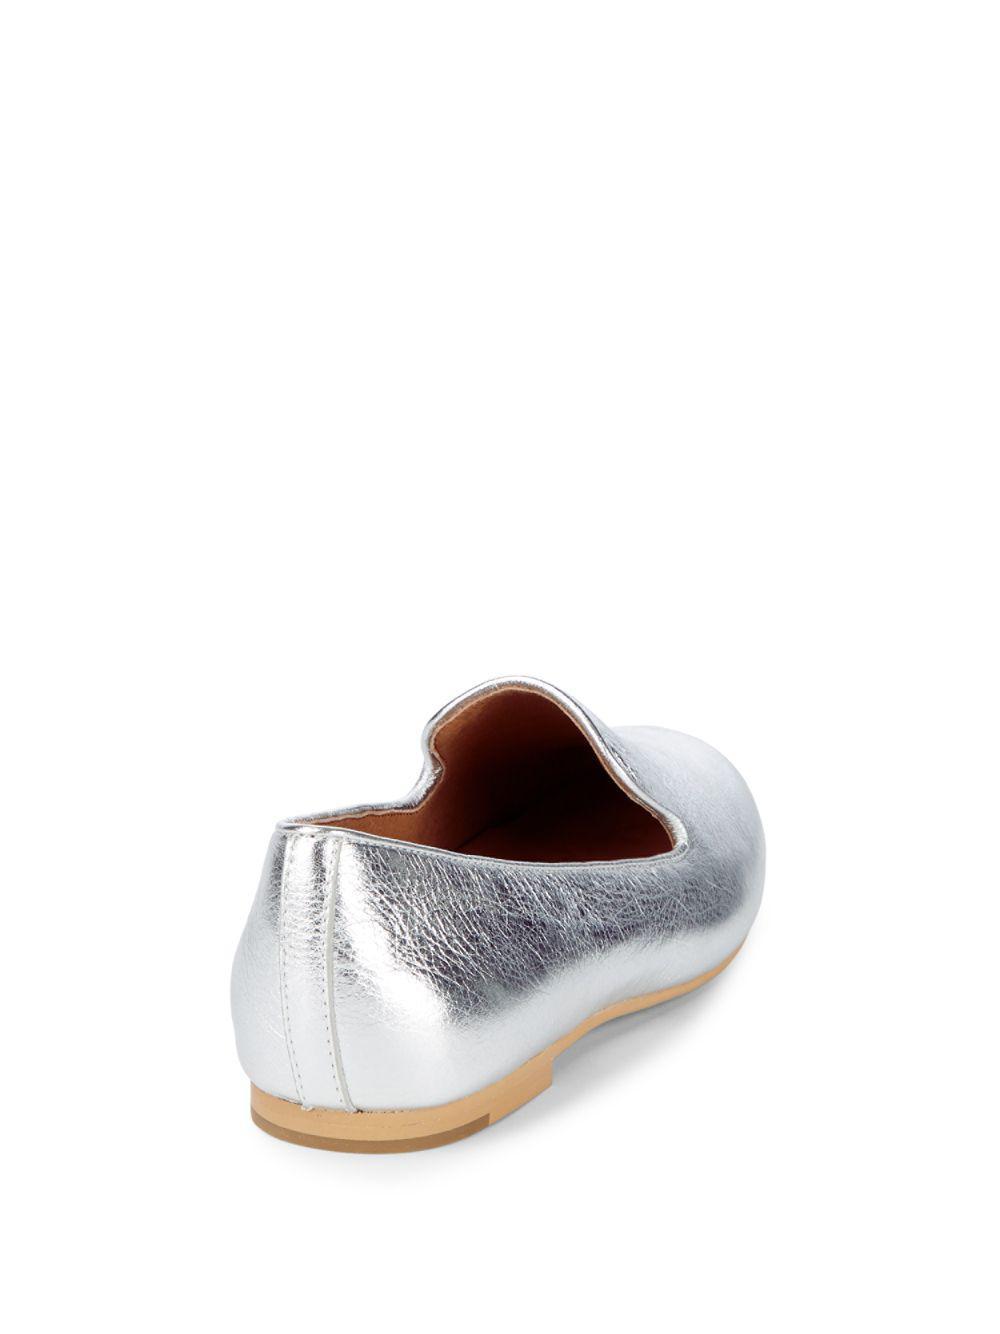 Eugene Metallic Leather Slip-on Loafer Gentle Souls 5Py1A